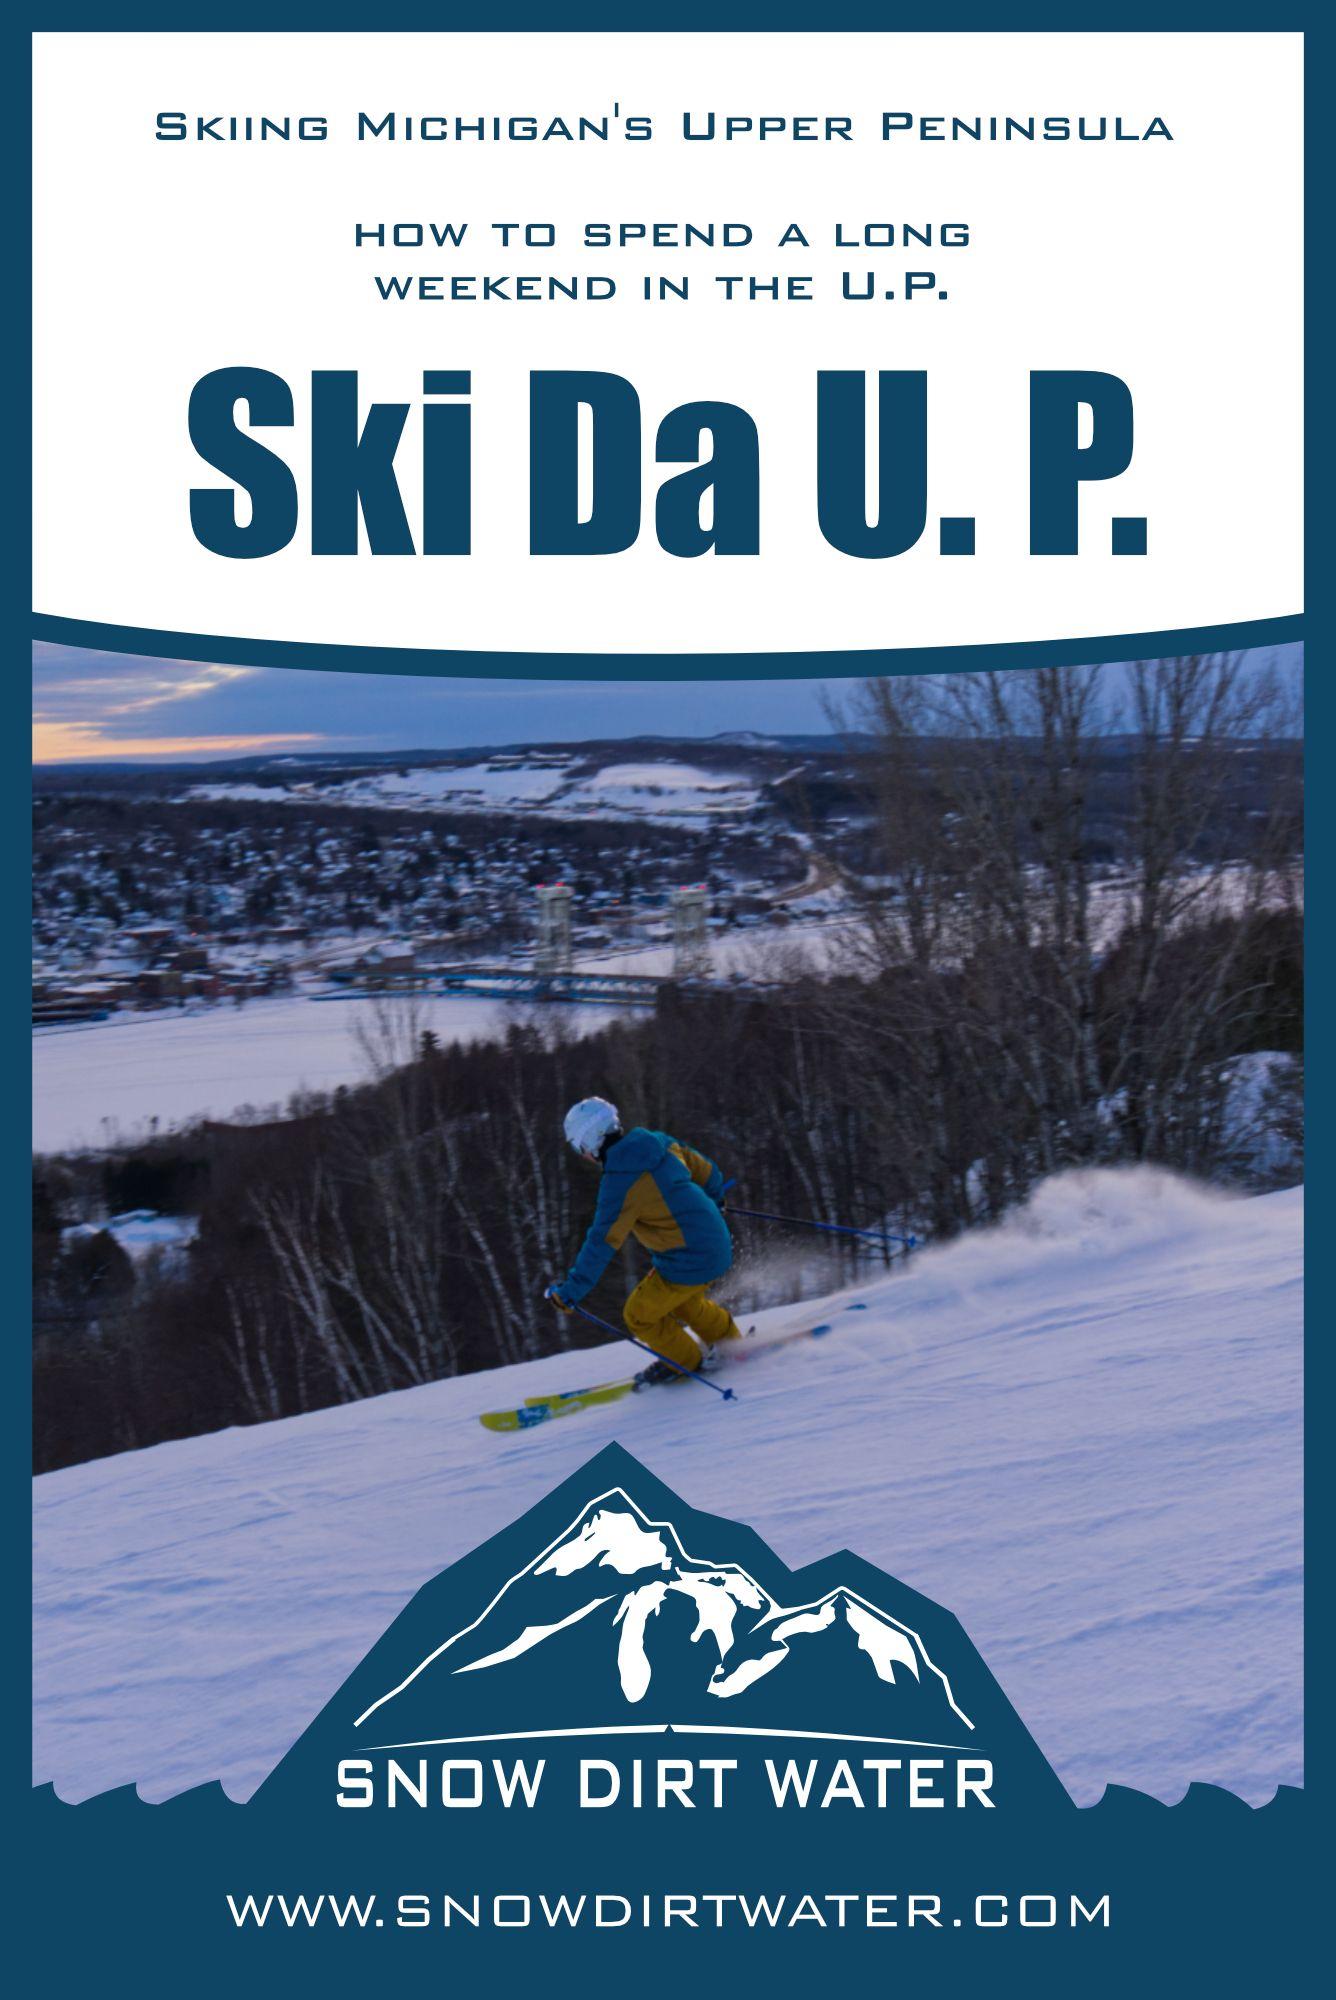 Ski The Michigan Upper Peninsula (4 days, 5 resorts) in